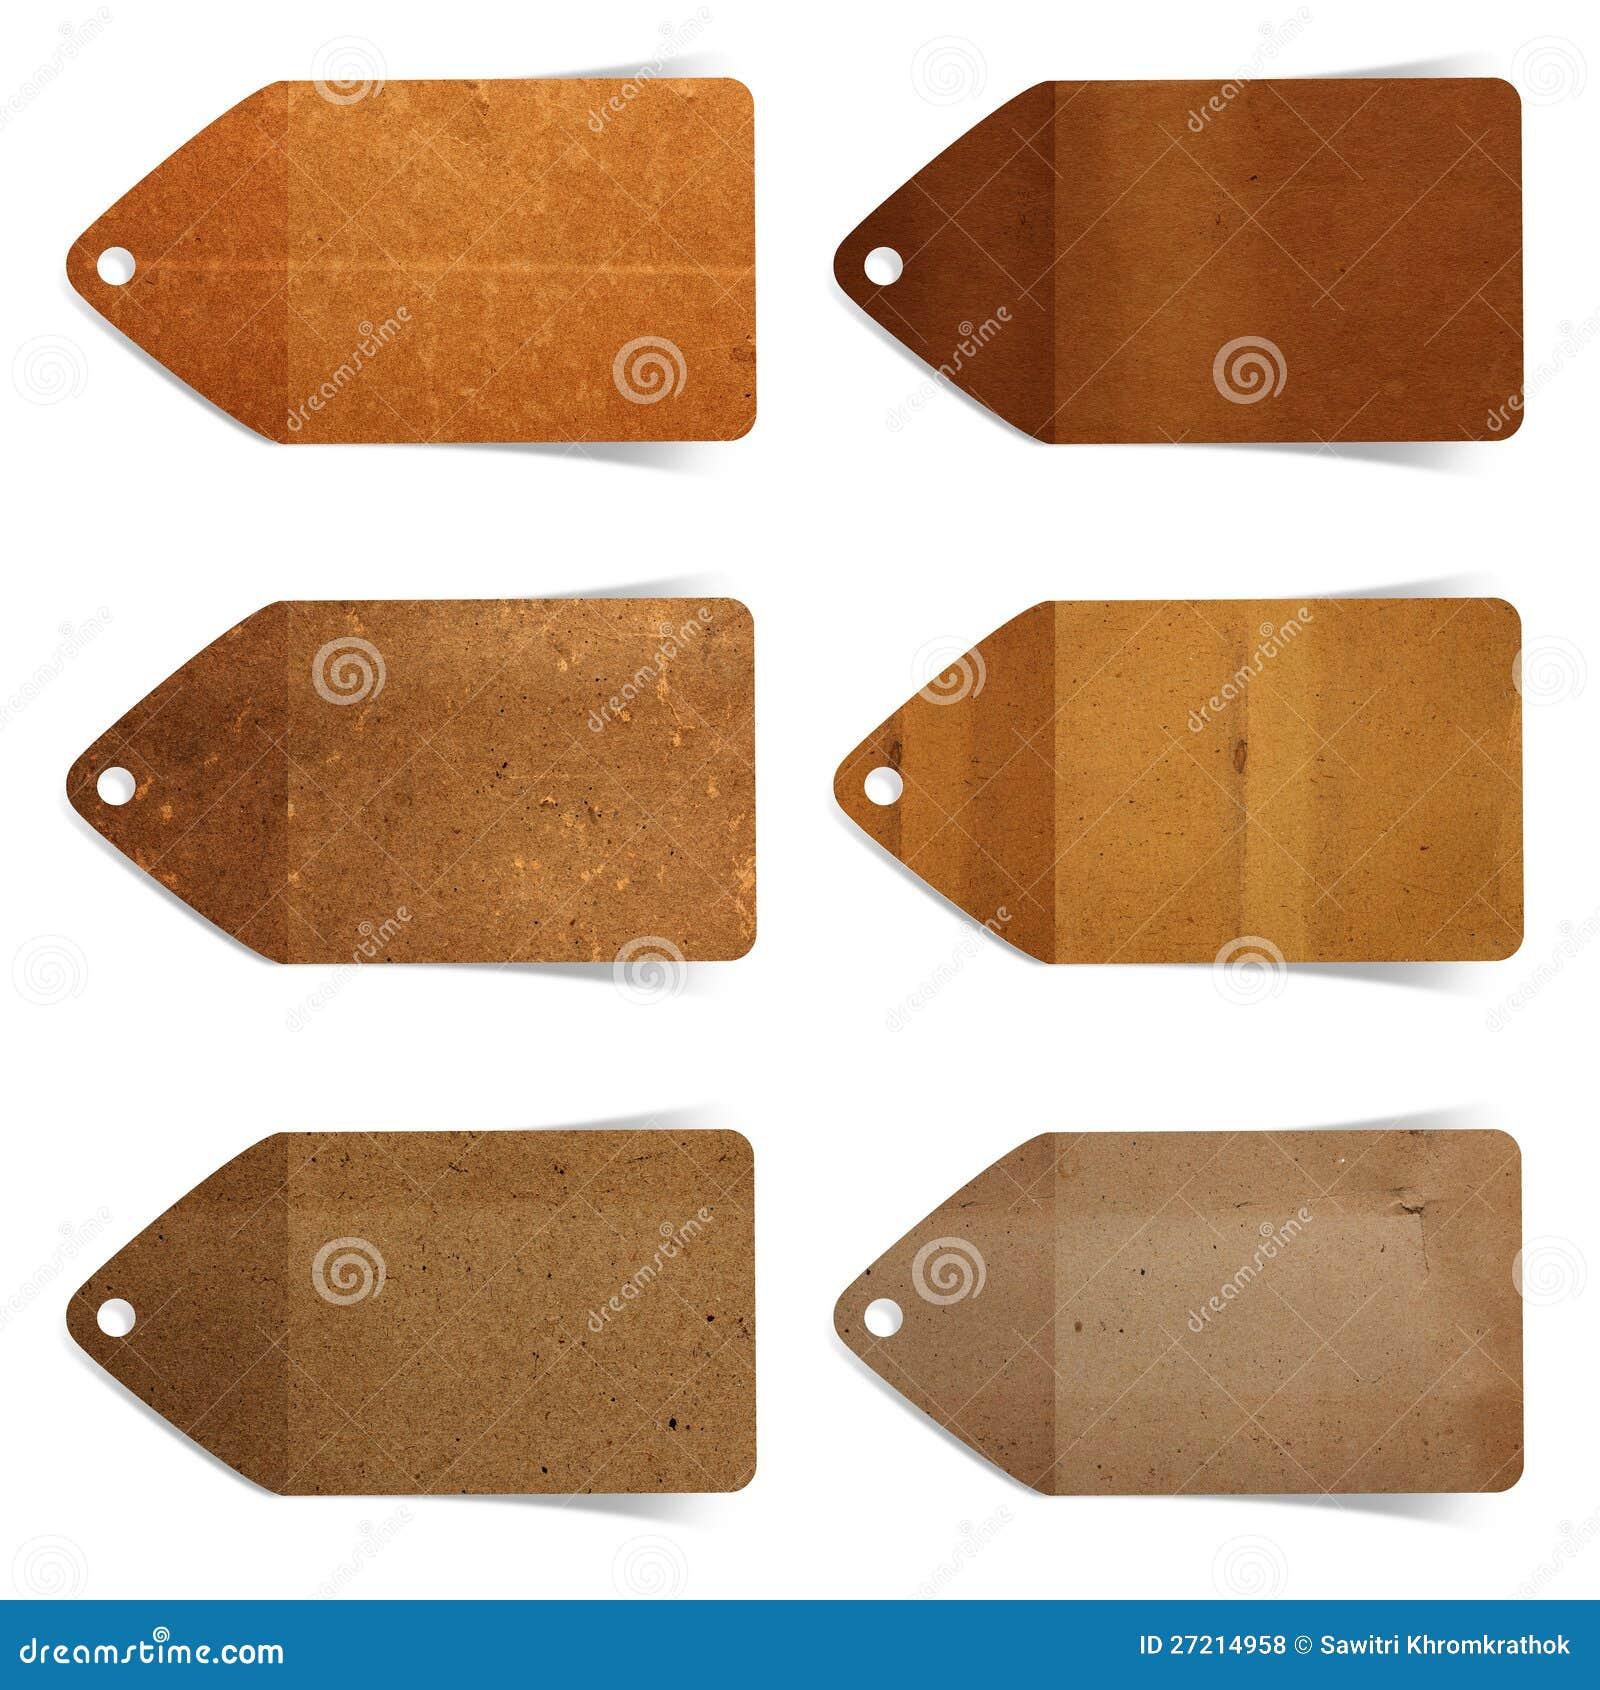 I tag background image - Background Craft Design Paper Stick Tag